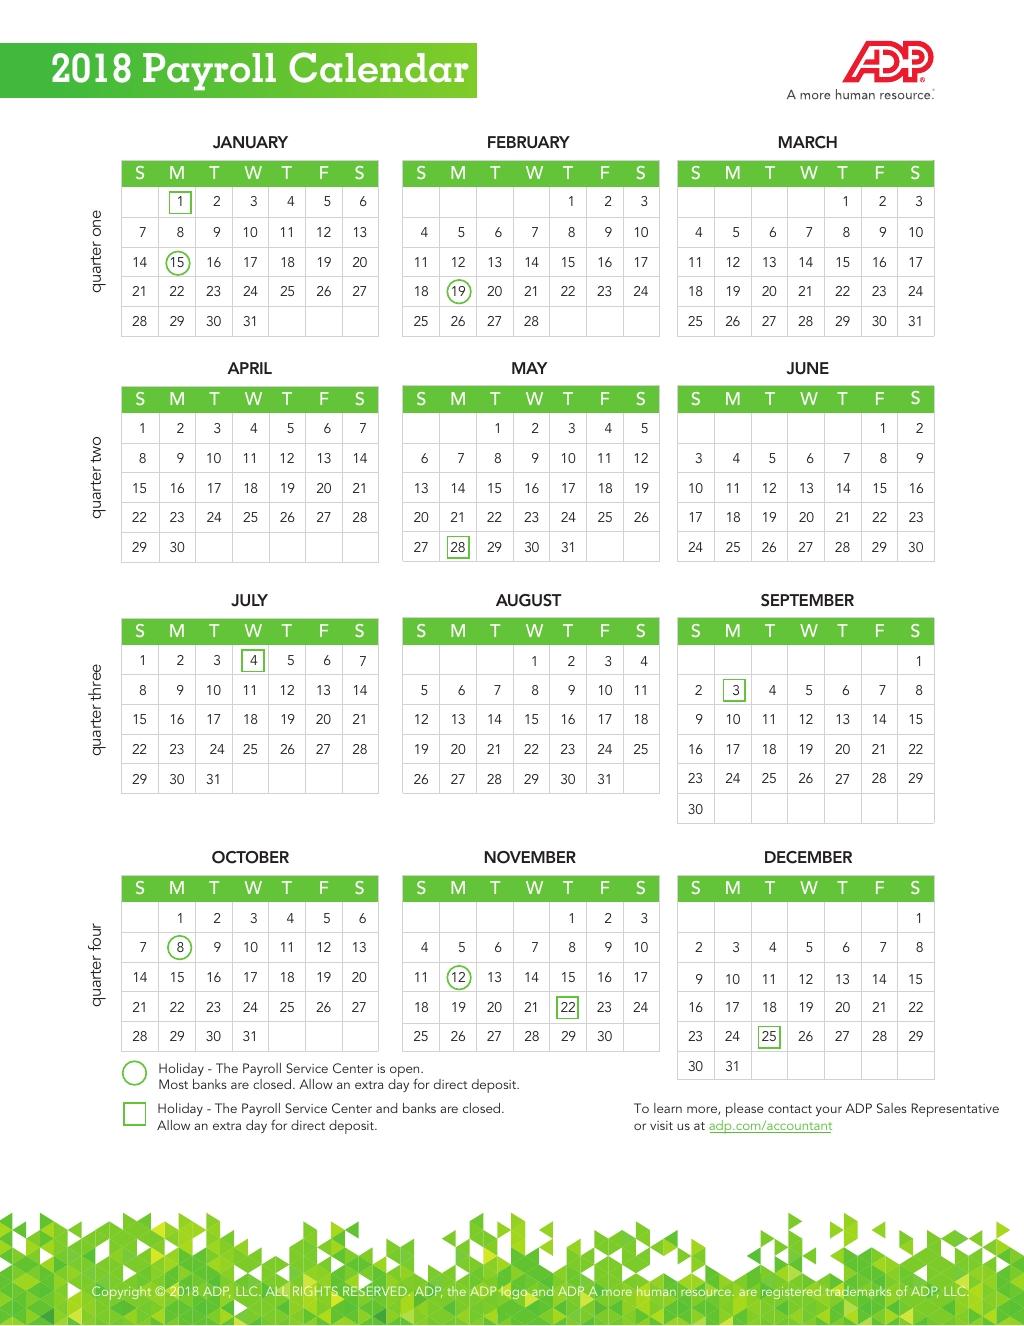 2020 Adp Payroll Calendar Biweekly | Payroll Calendar 2020